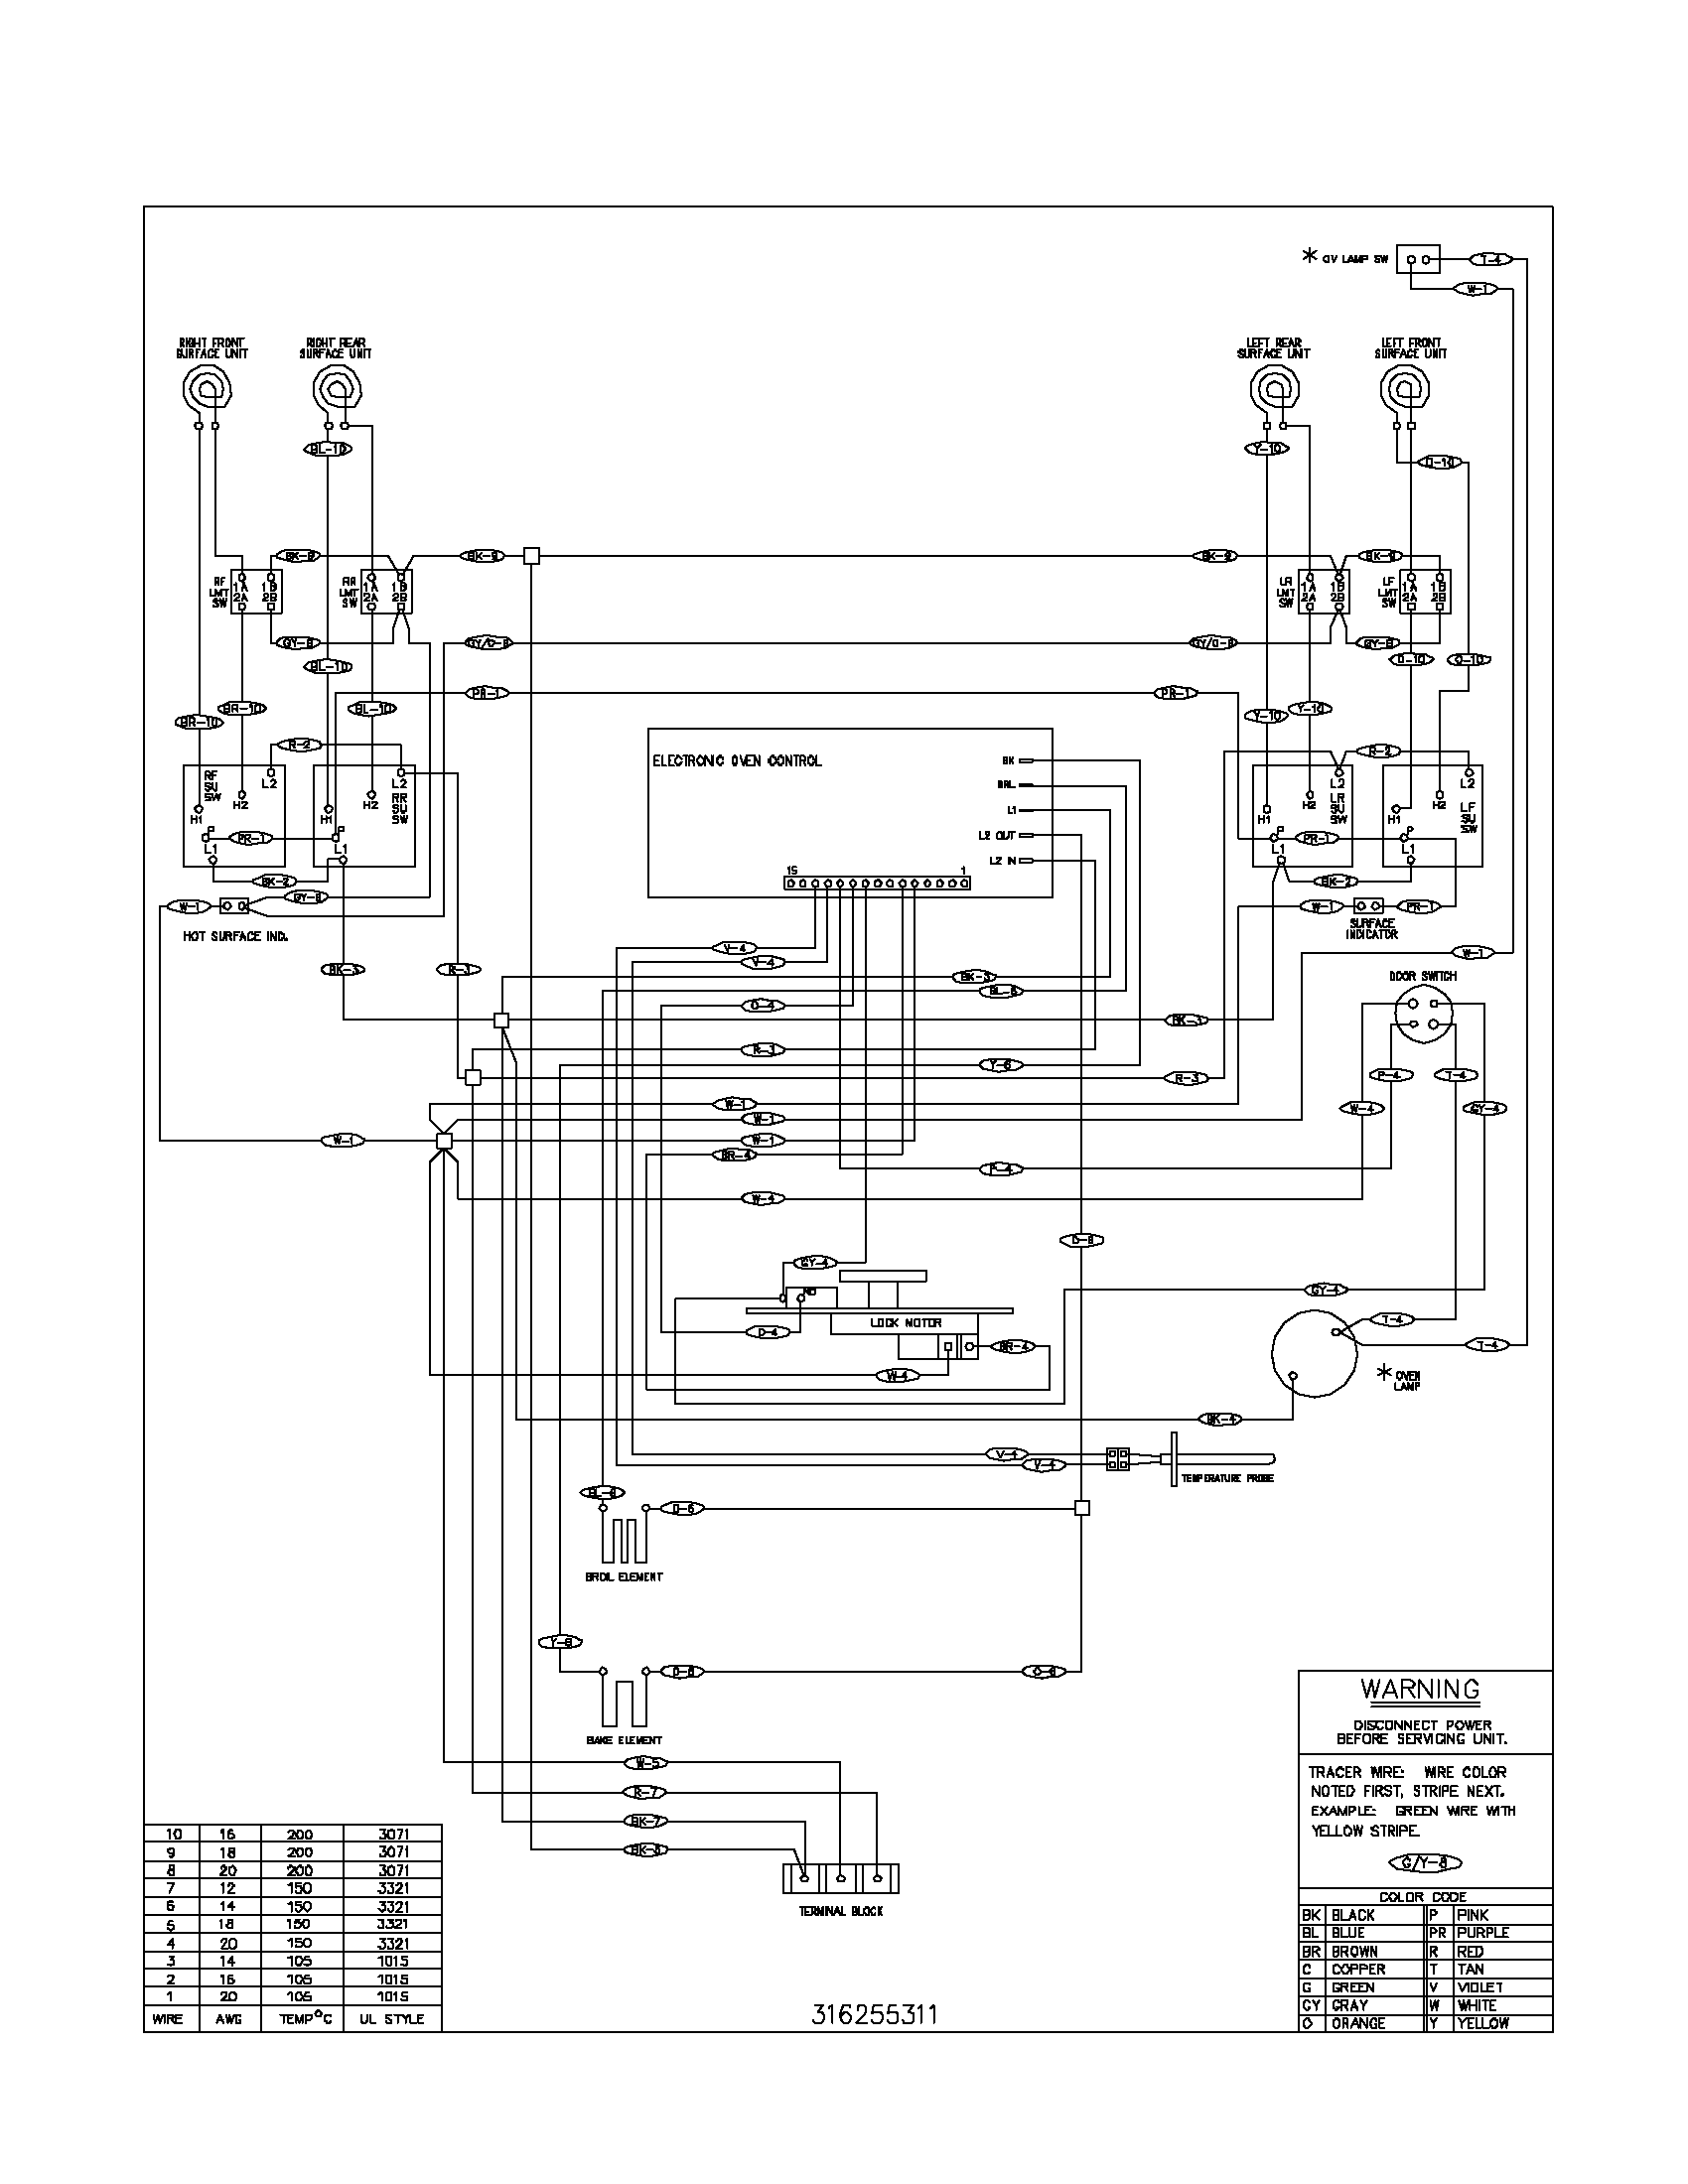 hight resolution of frigidaire oven wiring diagram wiring diagram val wiring diagram for a frigidaire oven wiring diagram for frigidaire oven